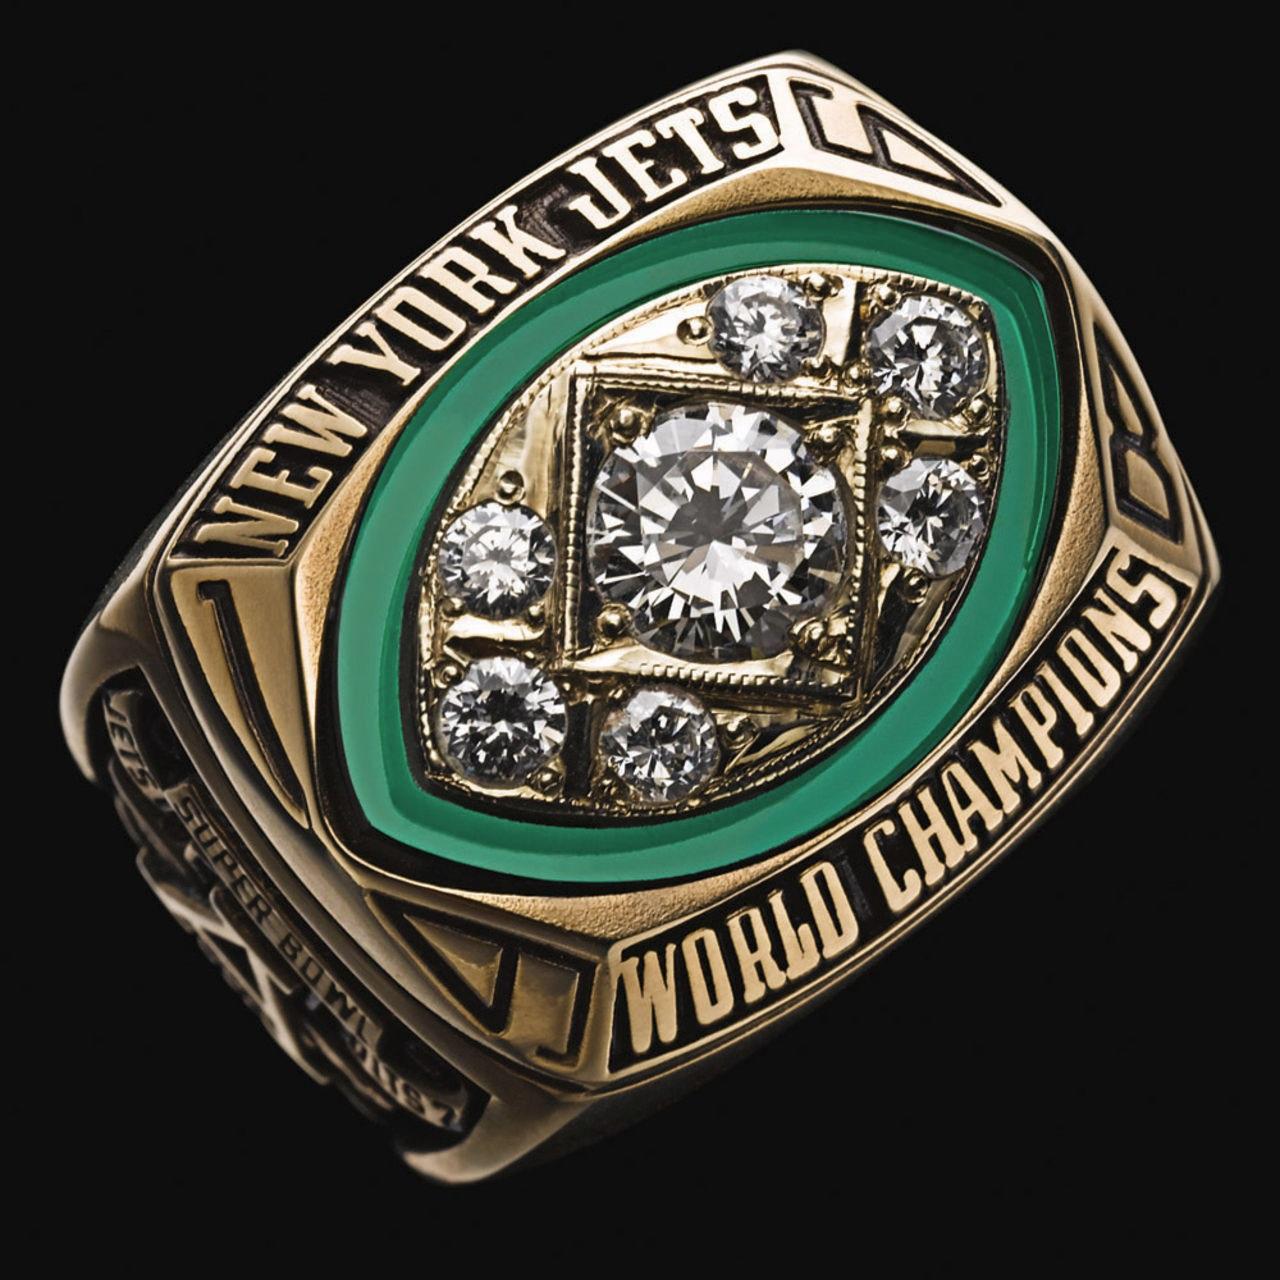 New York Jets 1969 champions ring